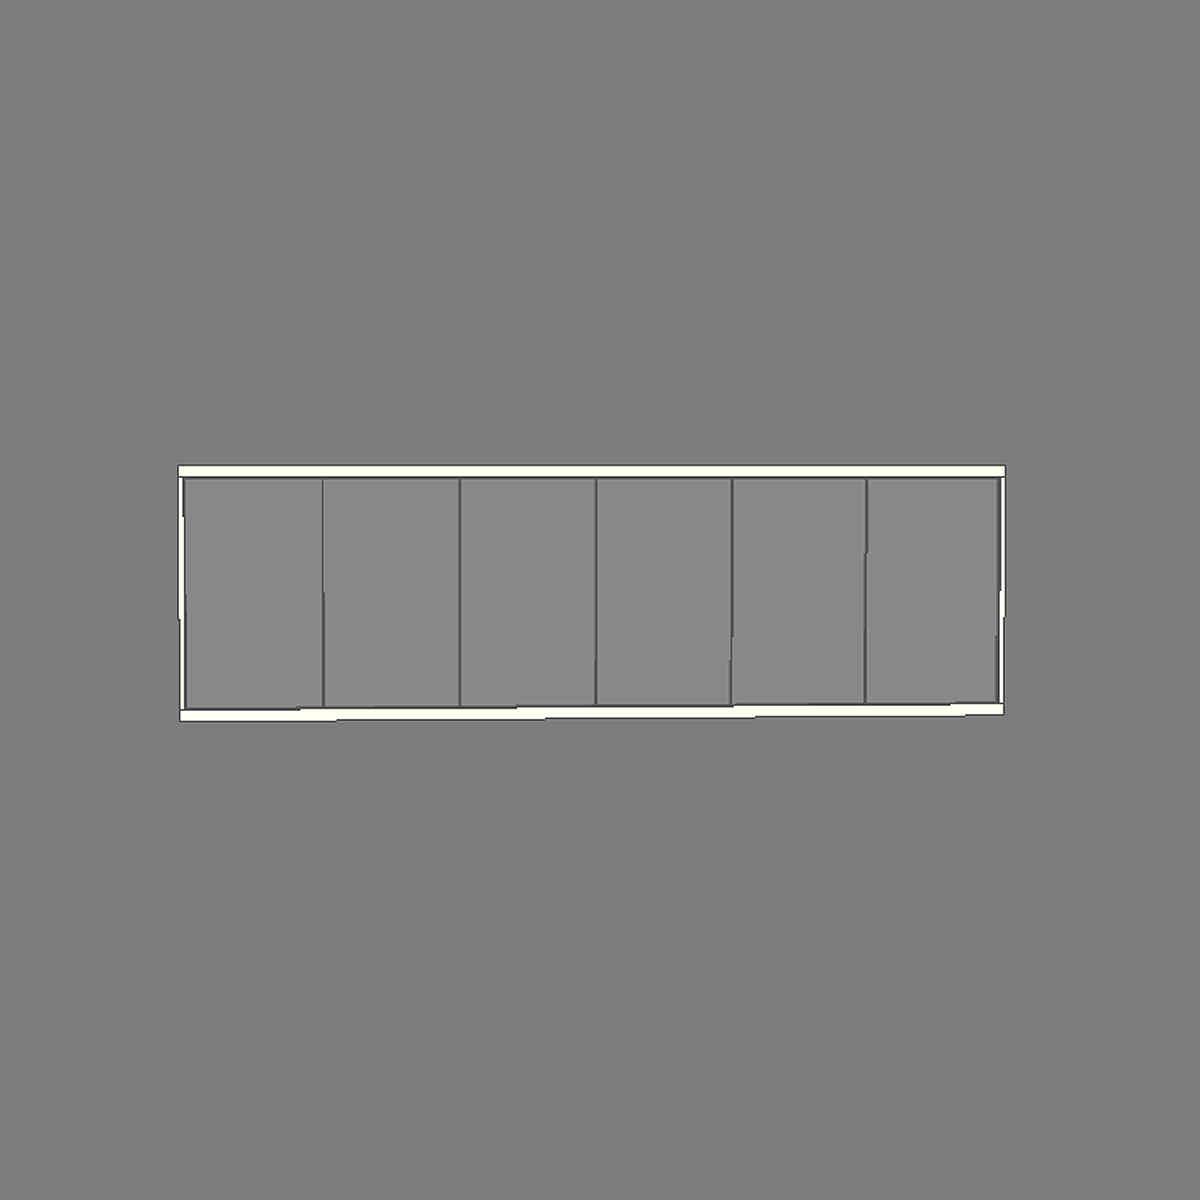 Window free 3d model max obj 3ds fbx c4d ma mb for Window 3d model